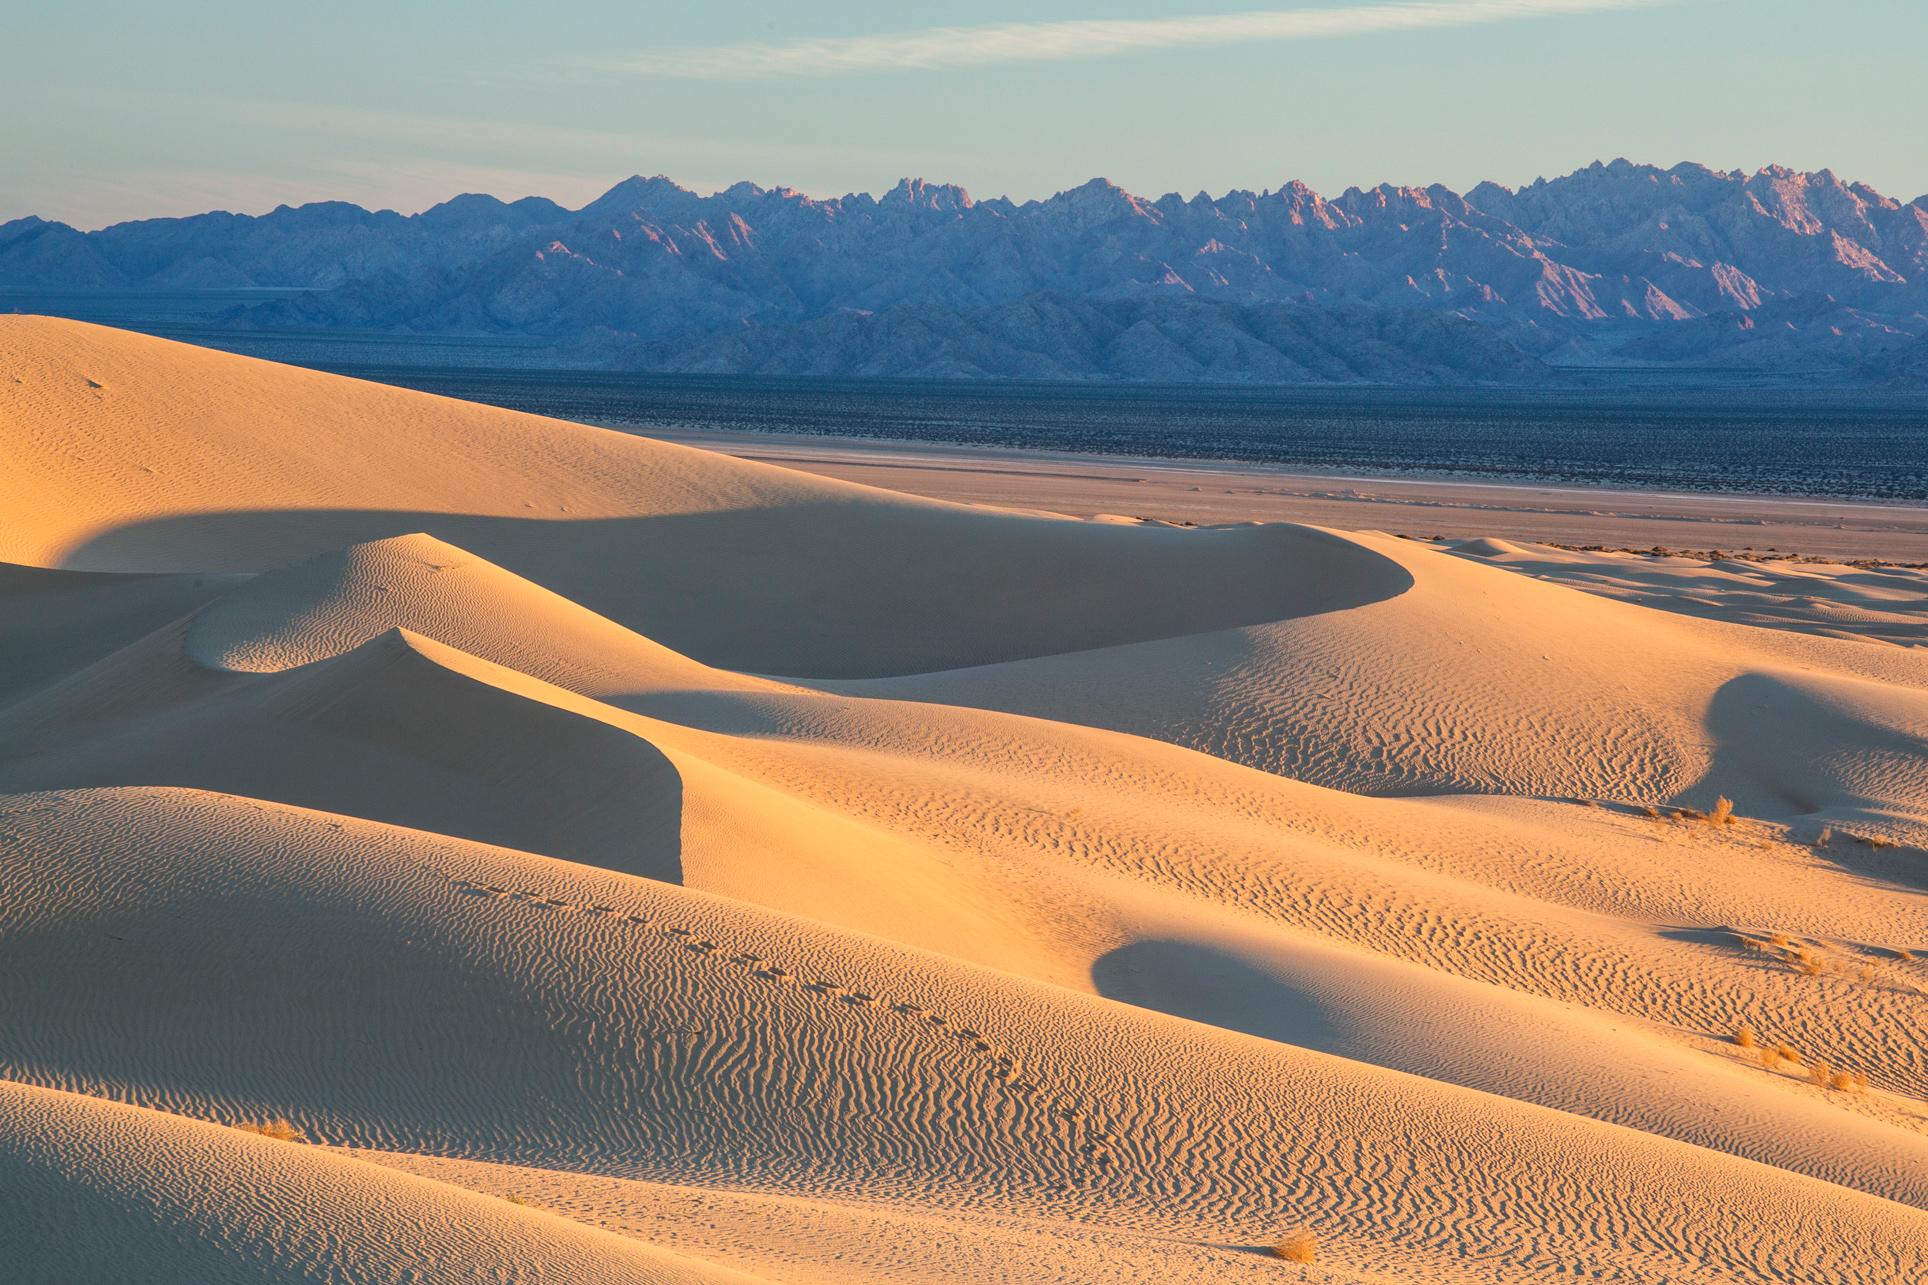 Mojave_Trails_National_Monument_dunes.jpg